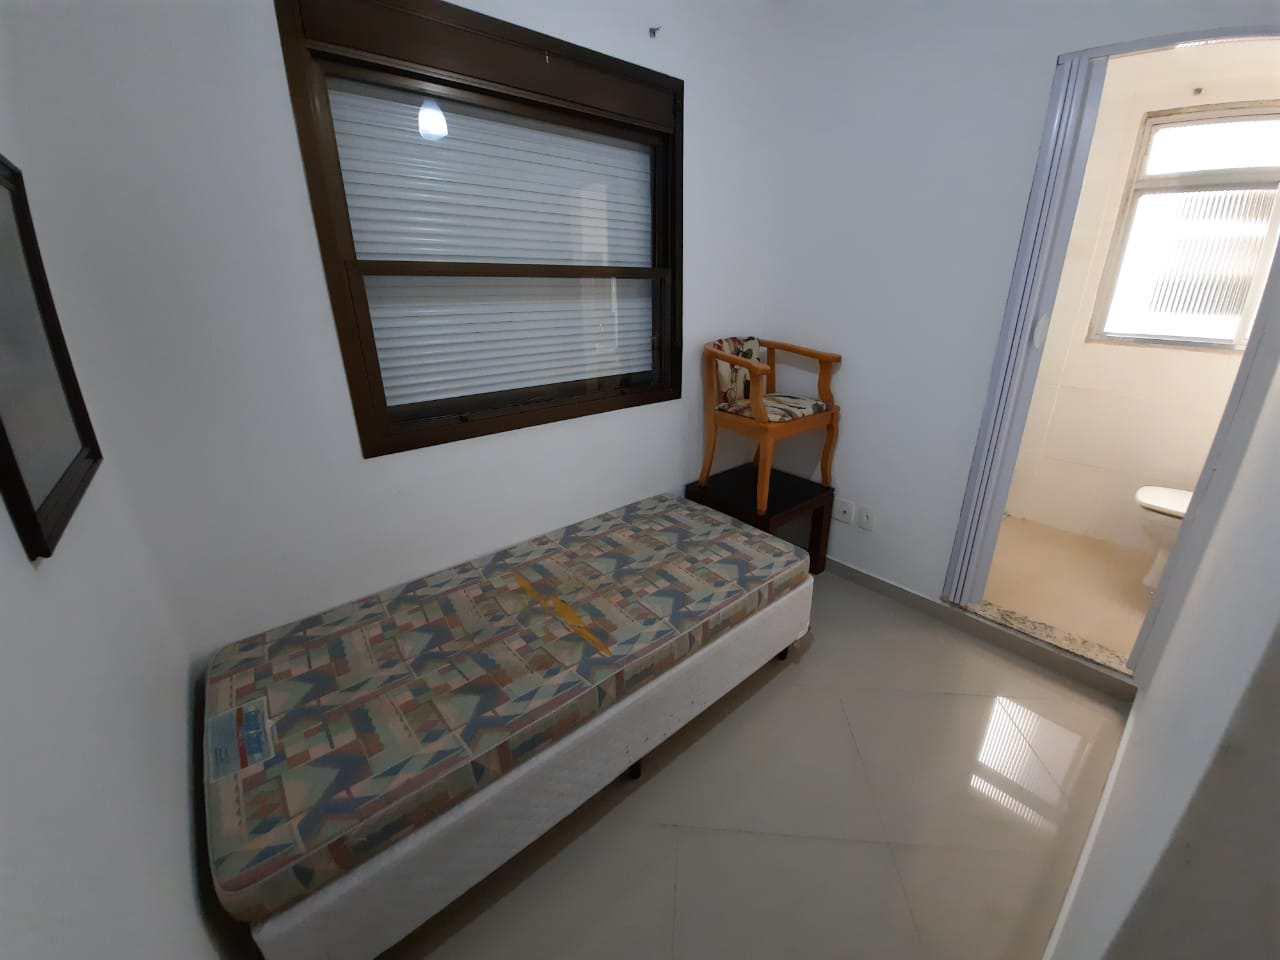 Apartamento com 3 dorms, Jardim Las Palmas, Guarujá - R$ 375 mil, Cod: 2972